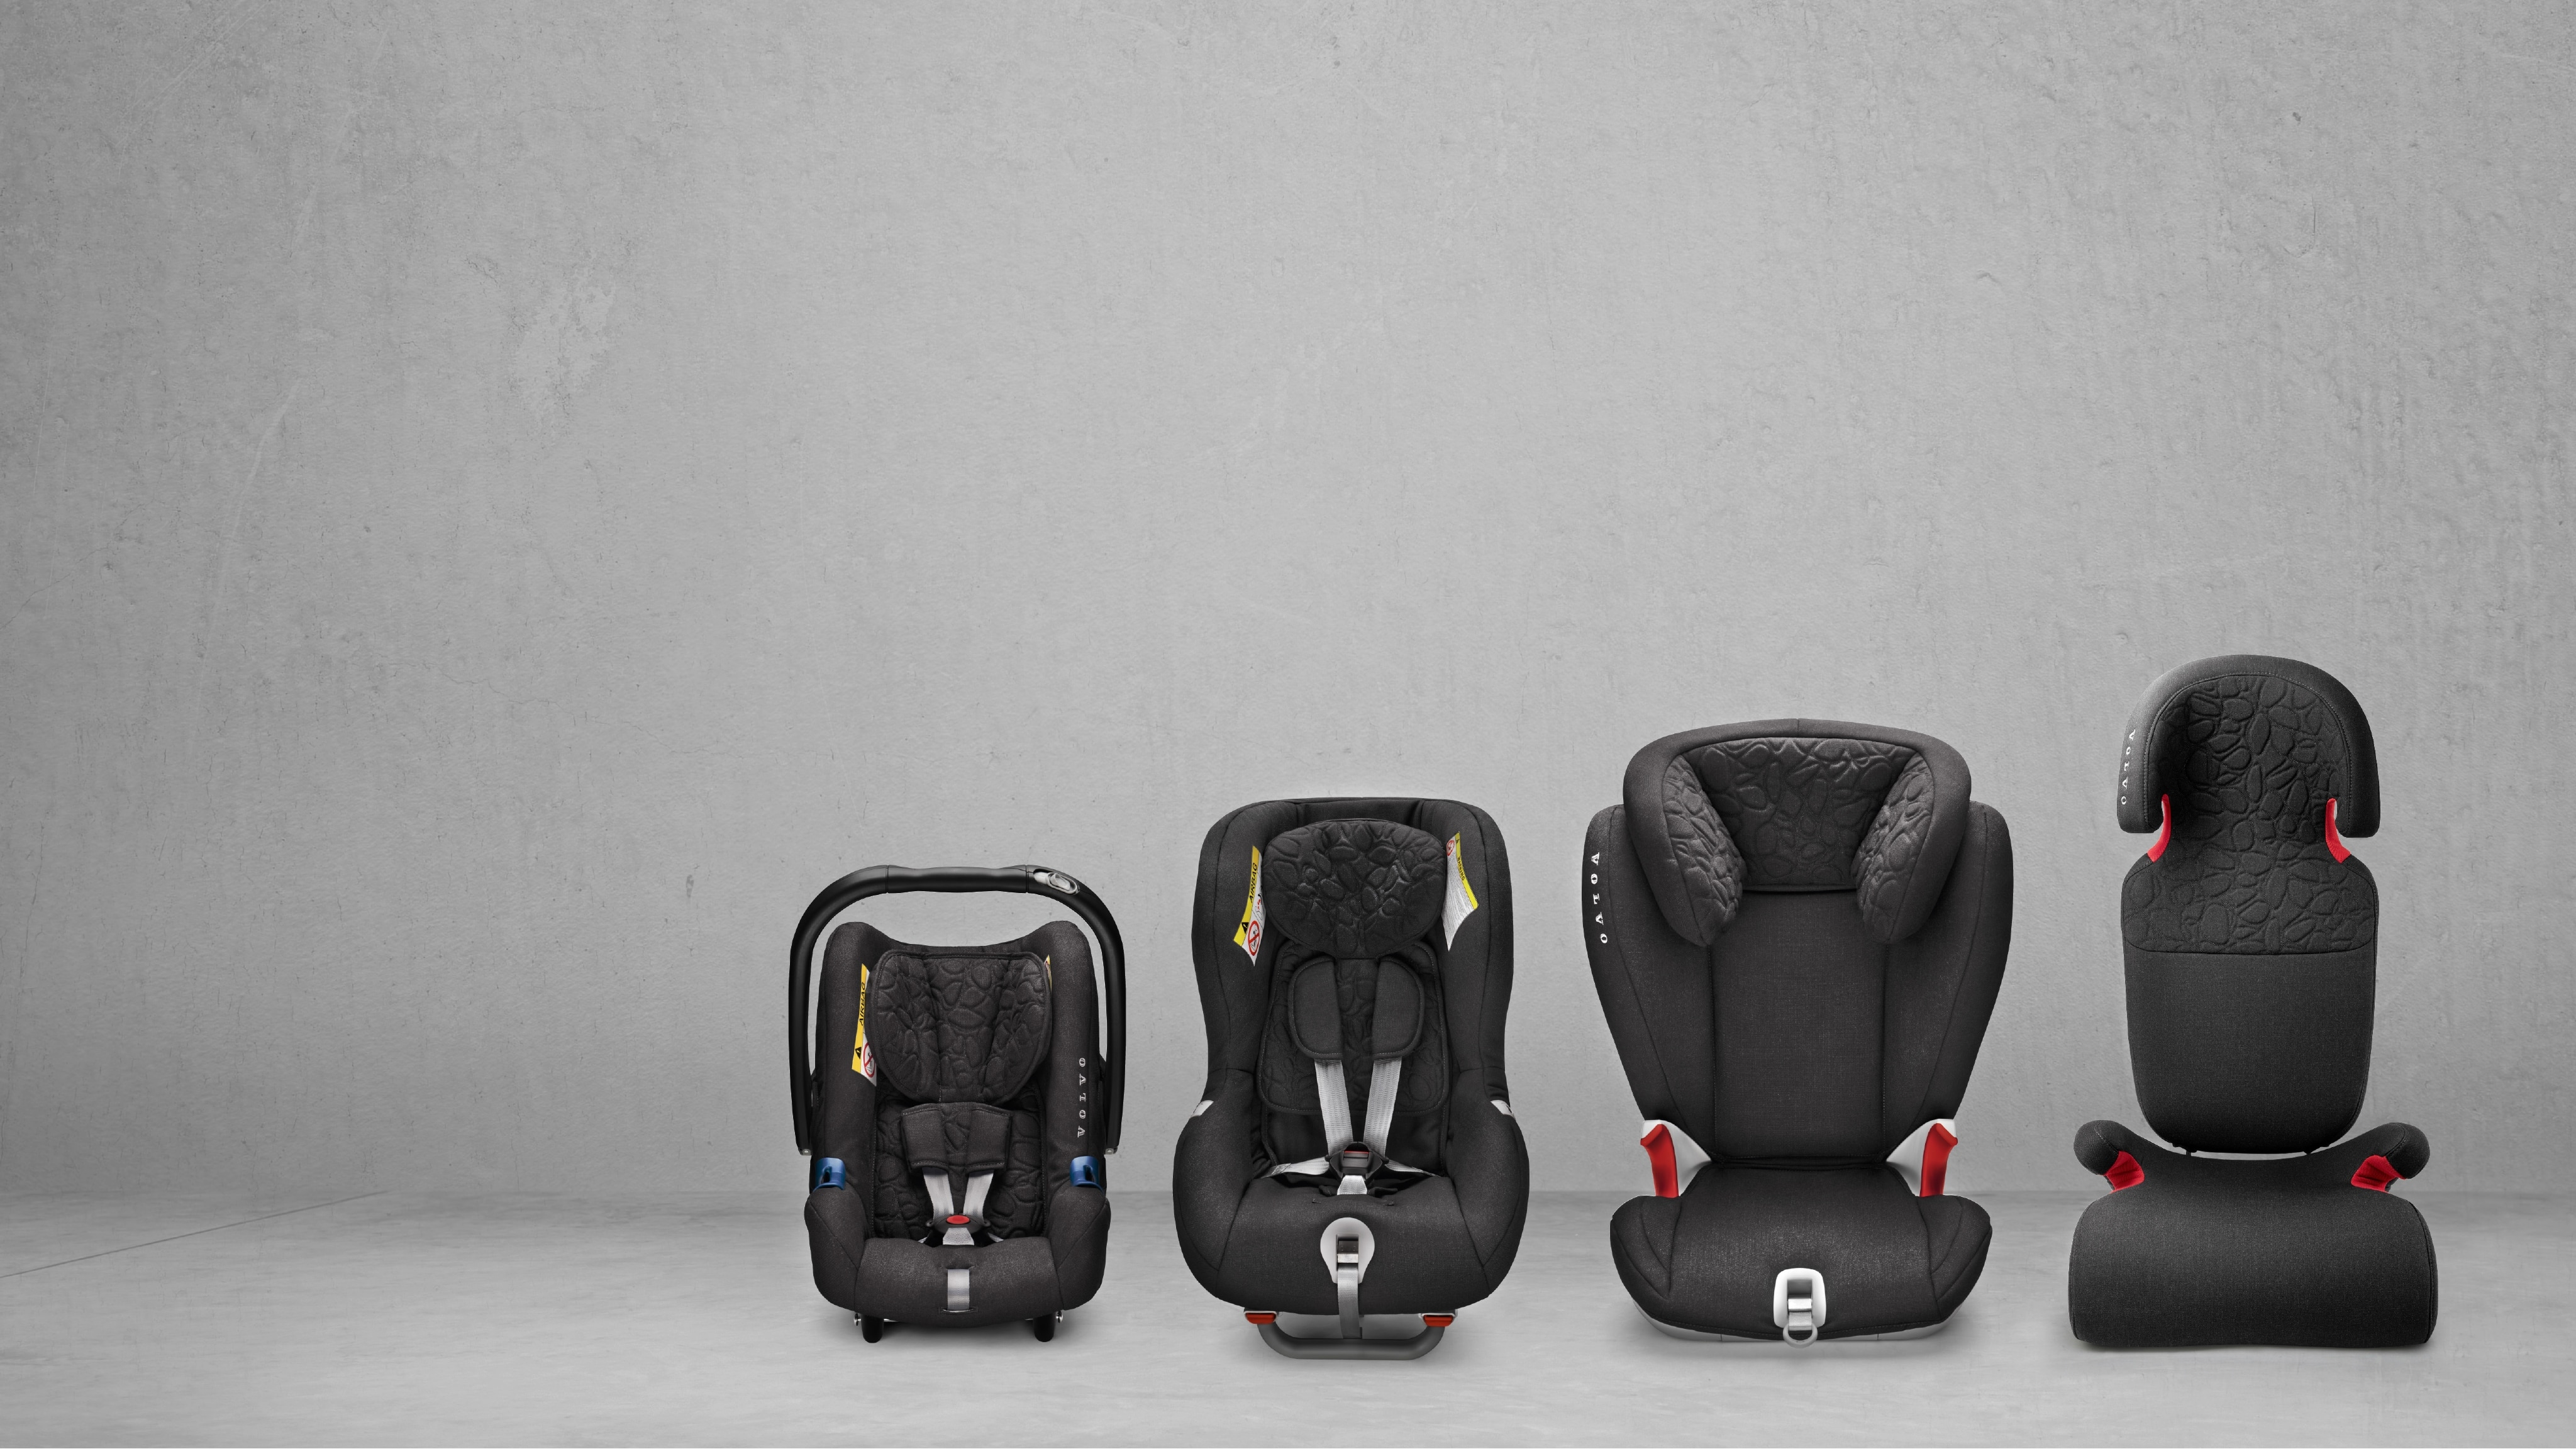 The Child Seats | Volvo Cars